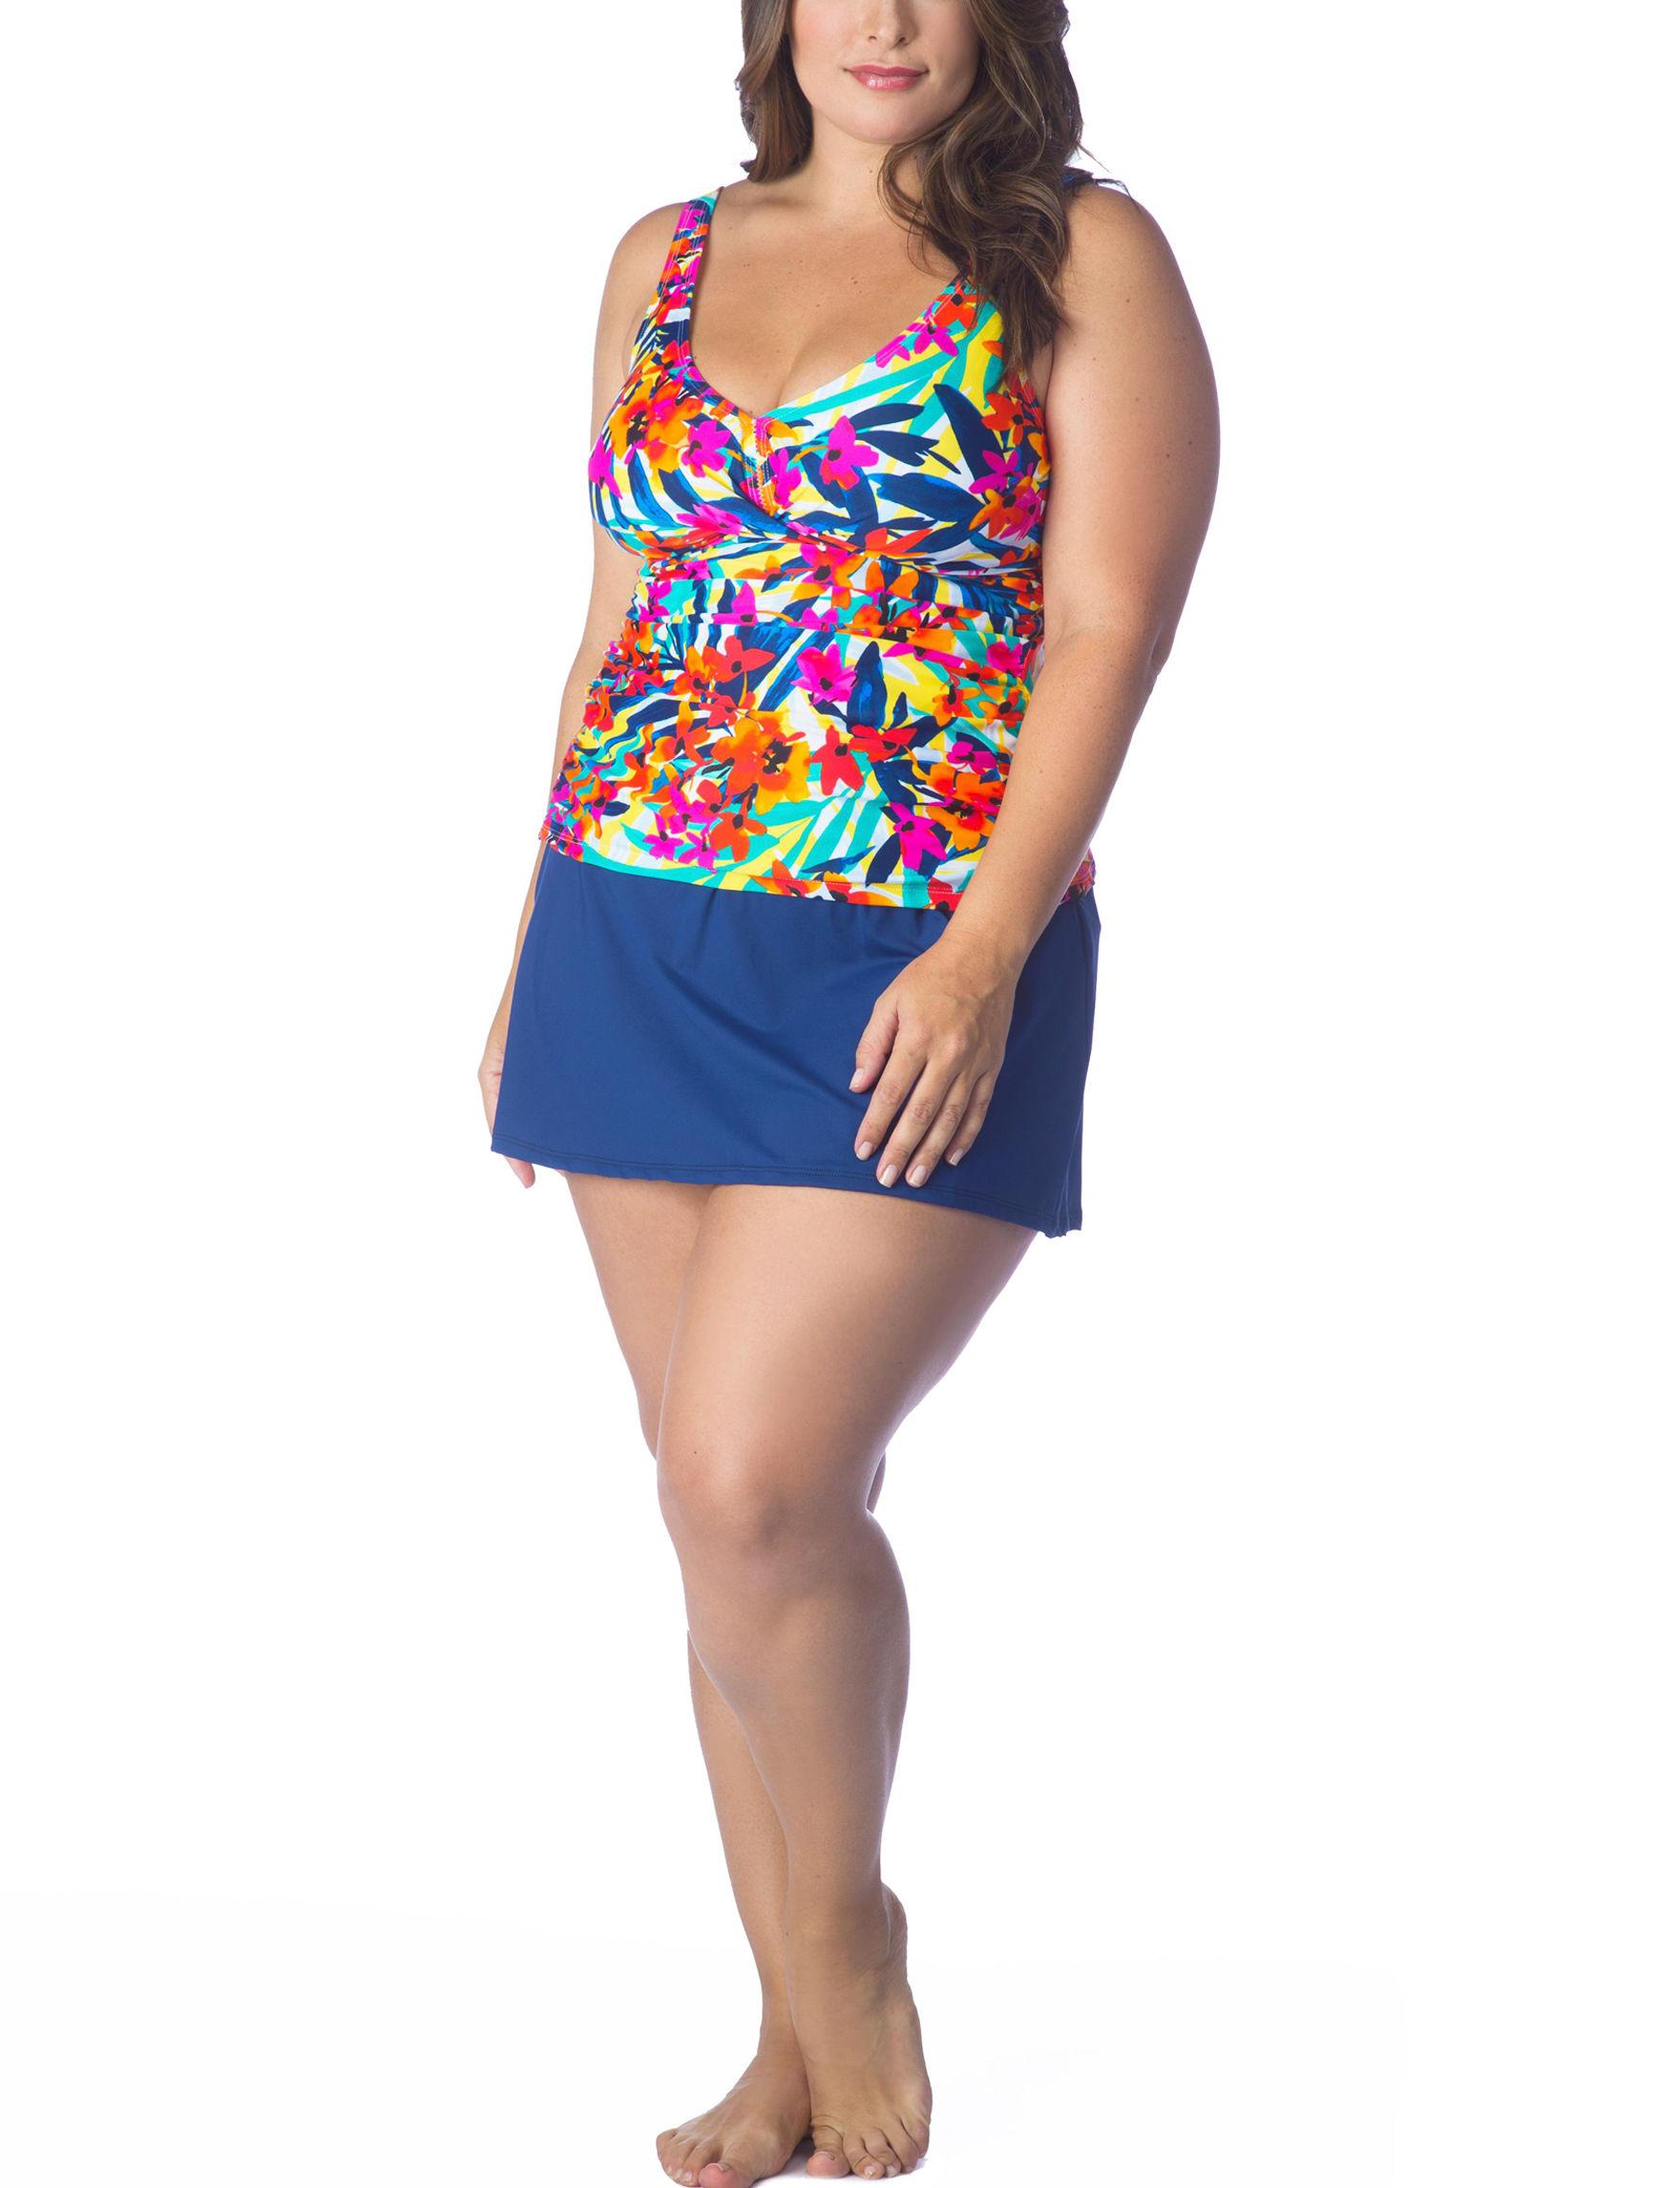 Chaps Pink Swimsuit Tops Tankini